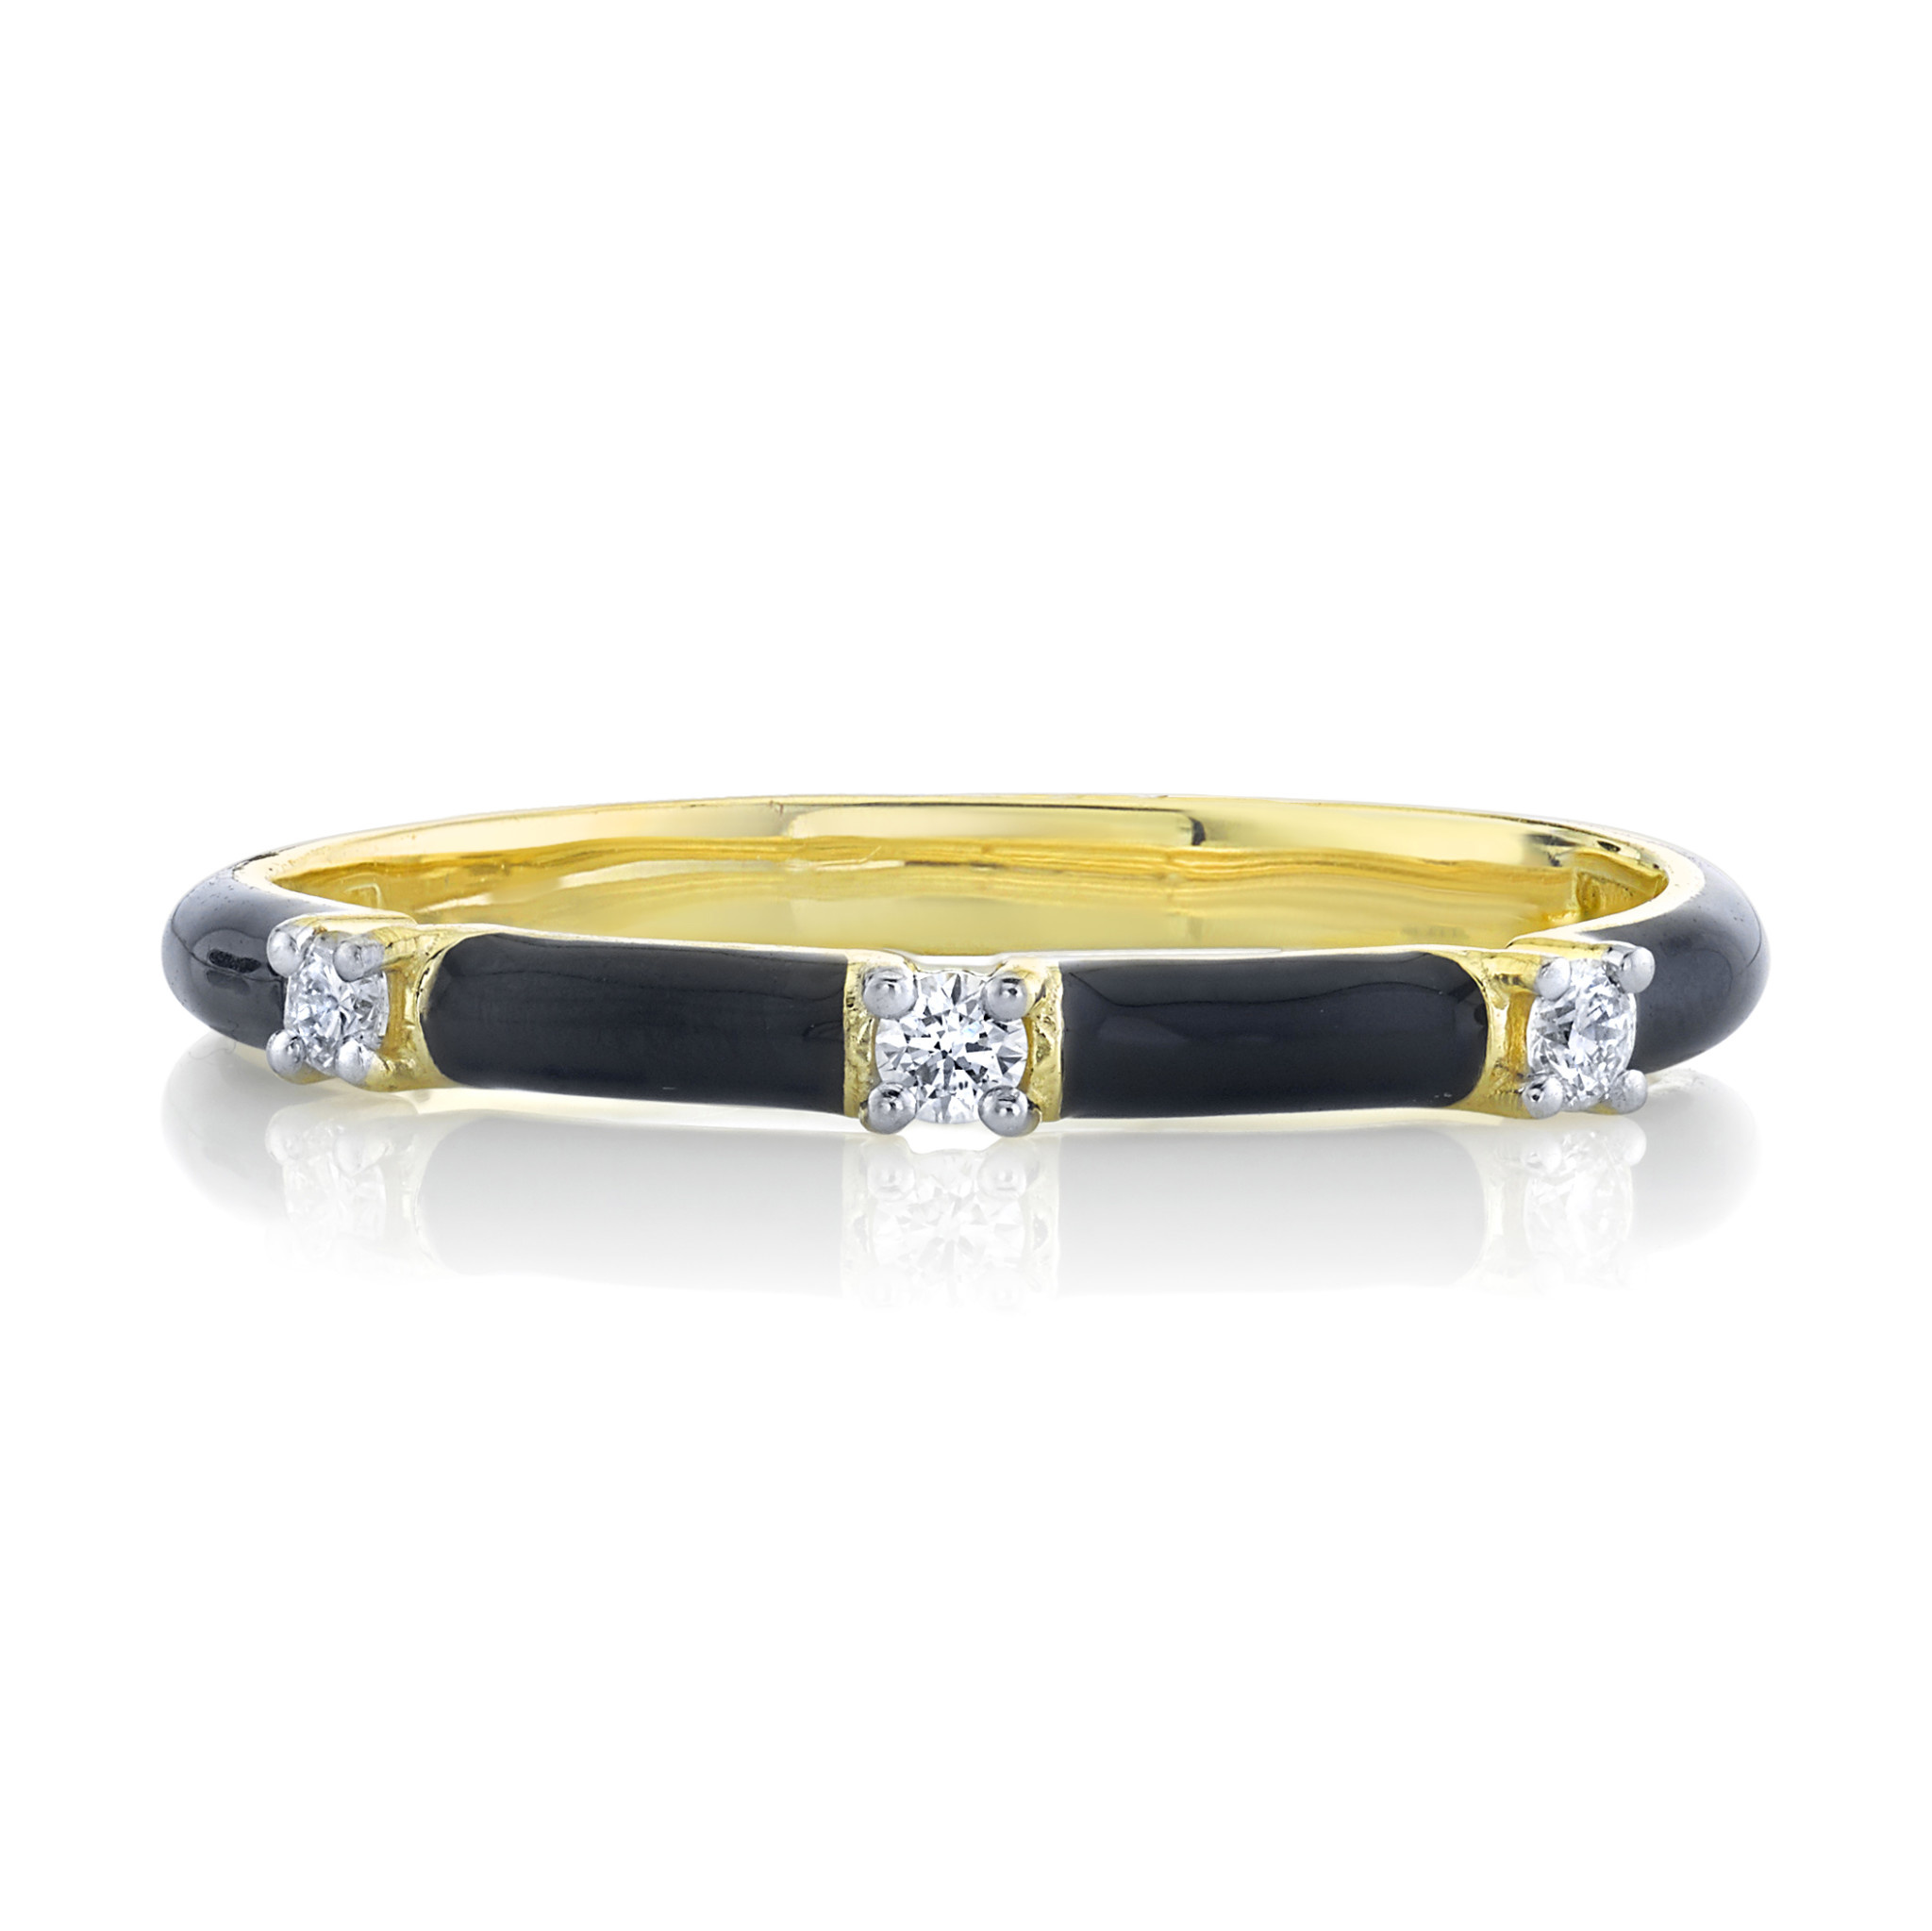 Black Enamel Stackers Ring with White Diamond Detail